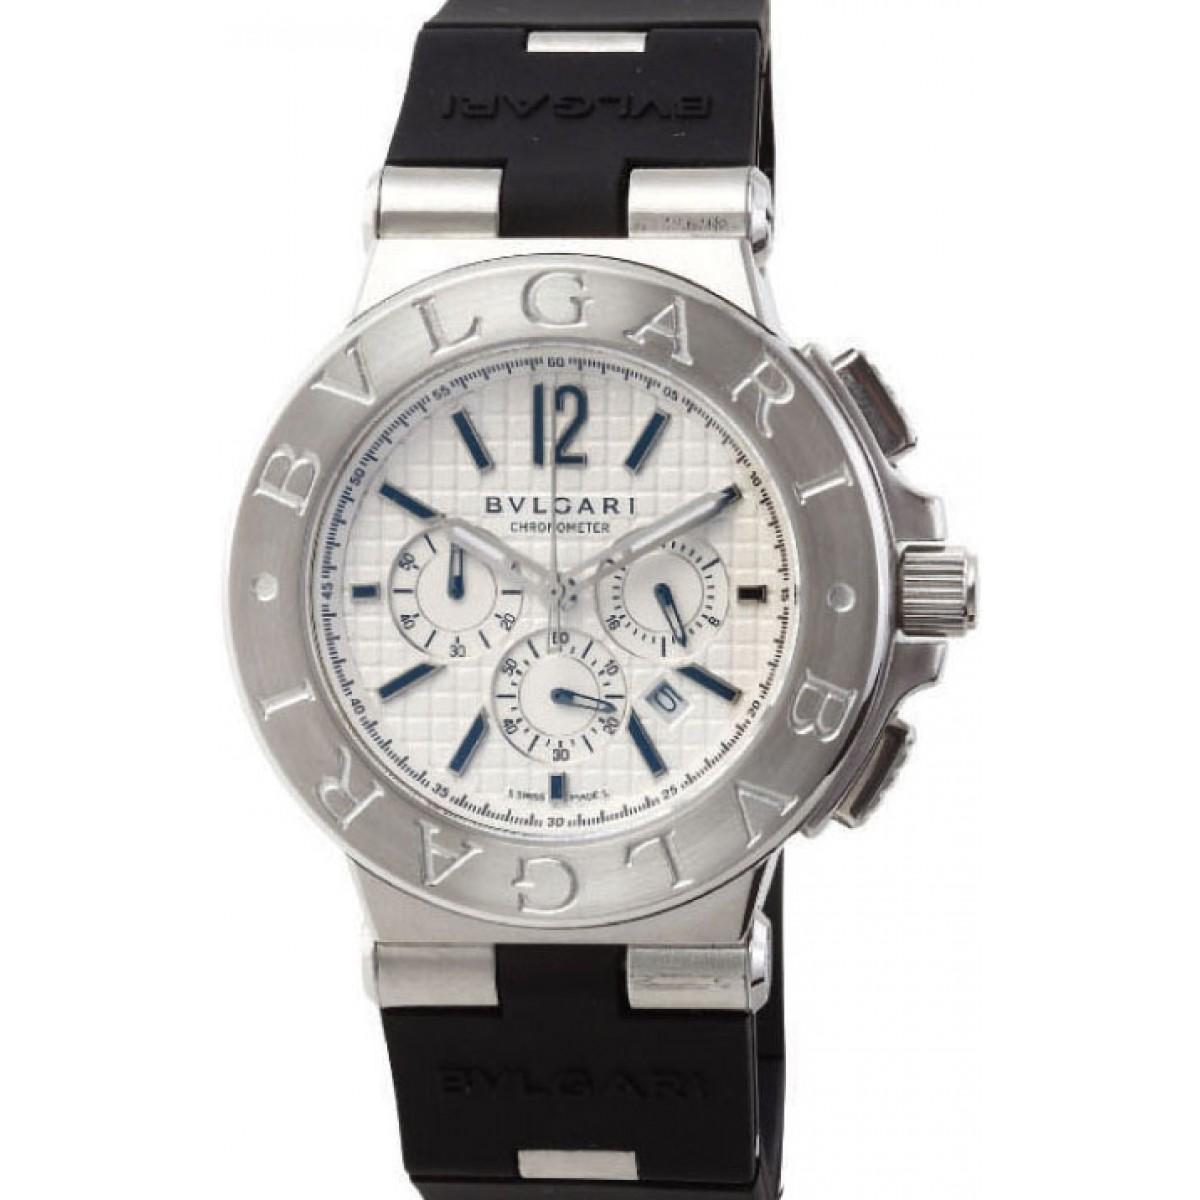 74216842f5a Relógio Réplica Bulgari Titanium Aço